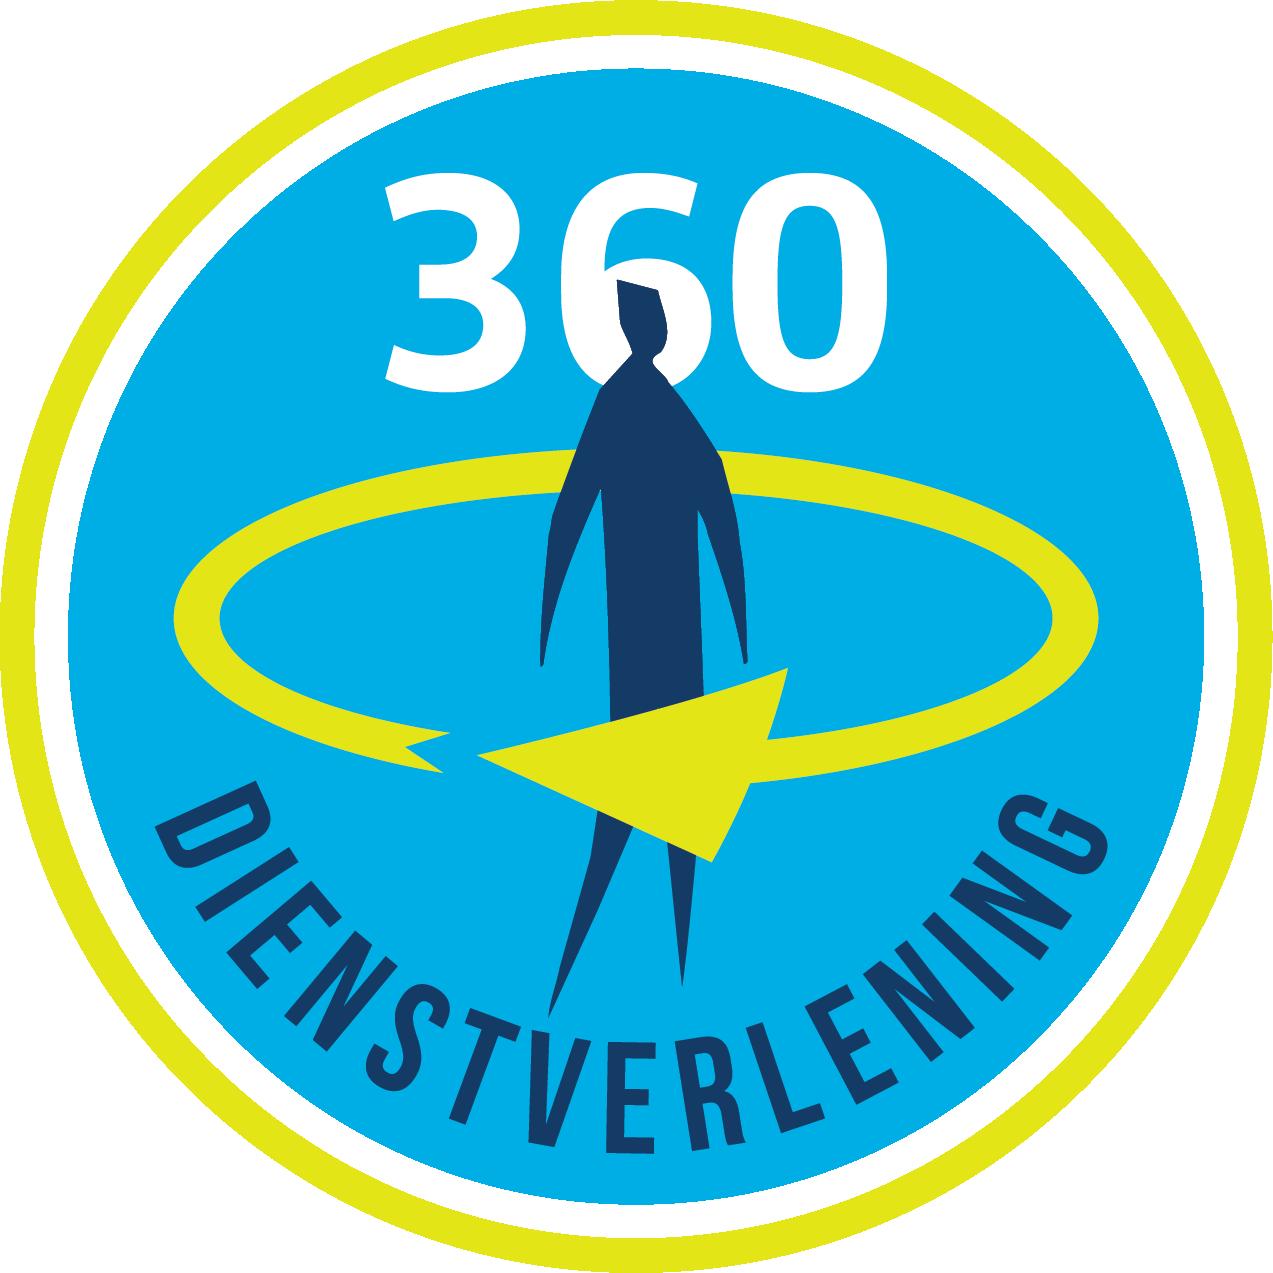 aclvb-universele_diensten-logo-cmyk_ok.png